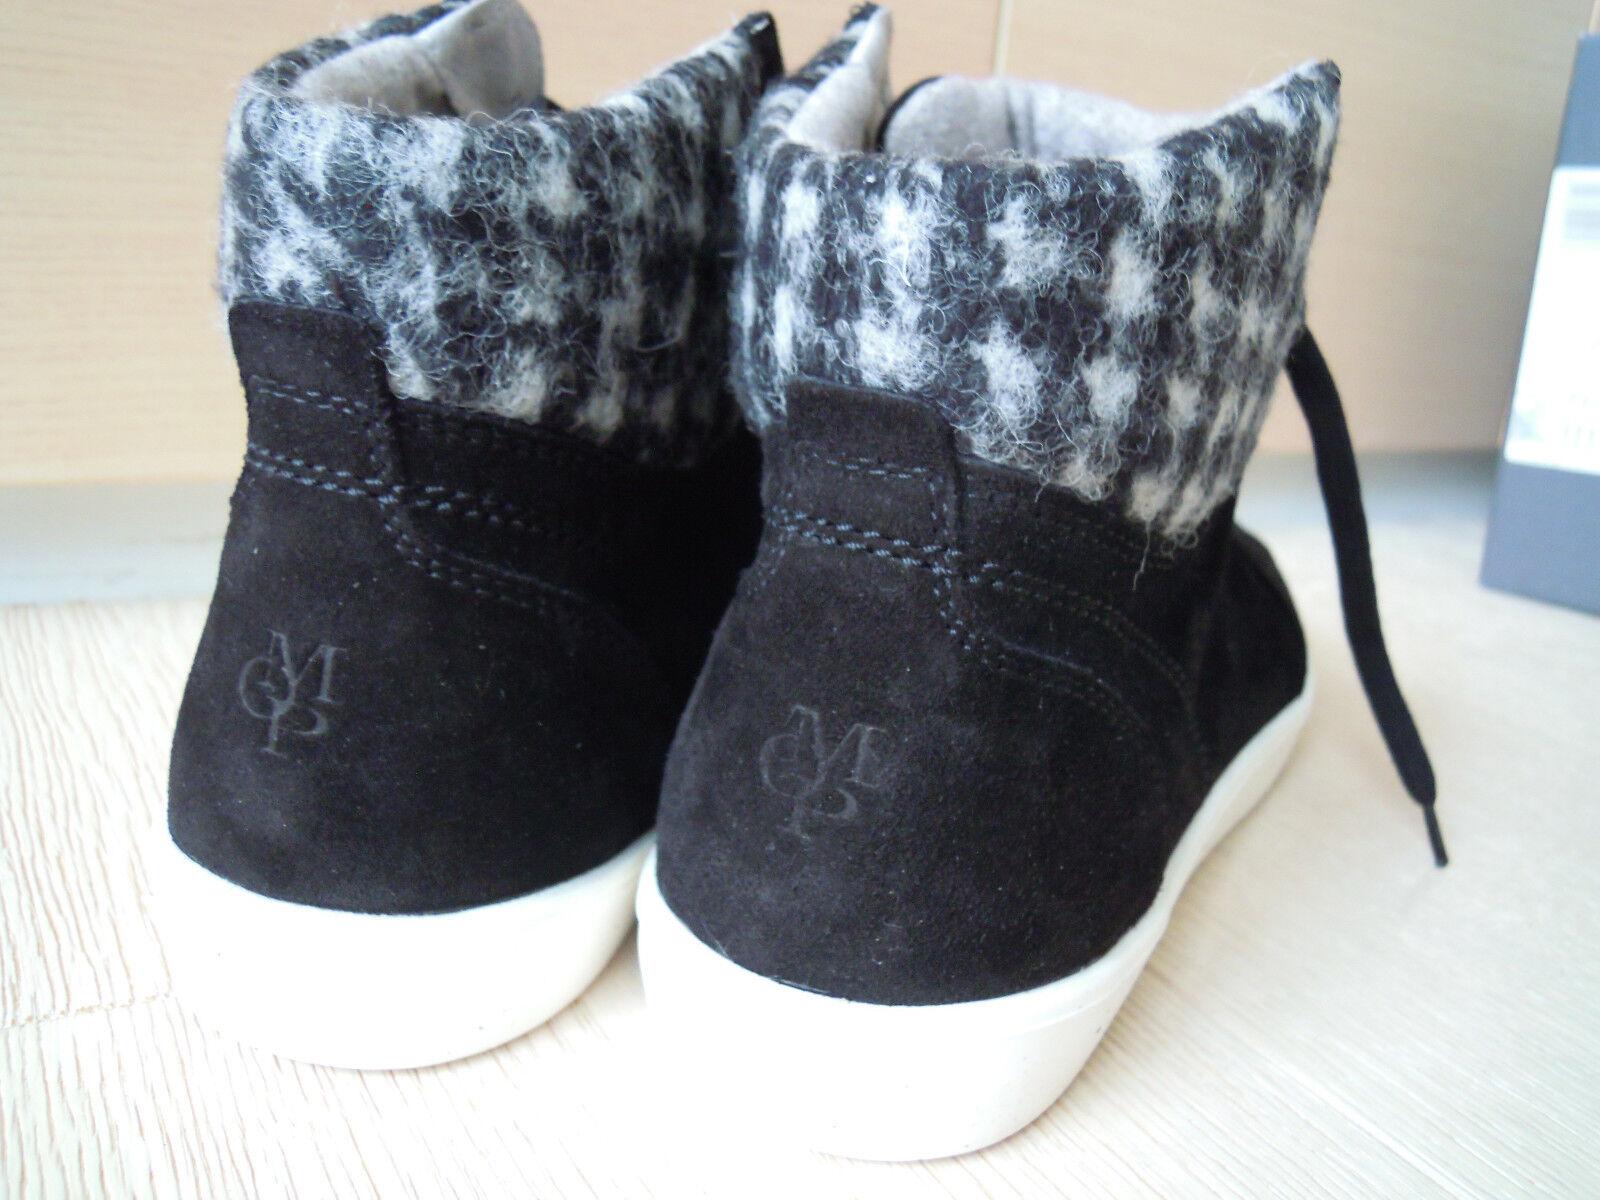 Marc O'Polo Sneaker Leder schwarz Schuhe Damen Gr. 40 Herren & Damen Schuhe 7f1f66